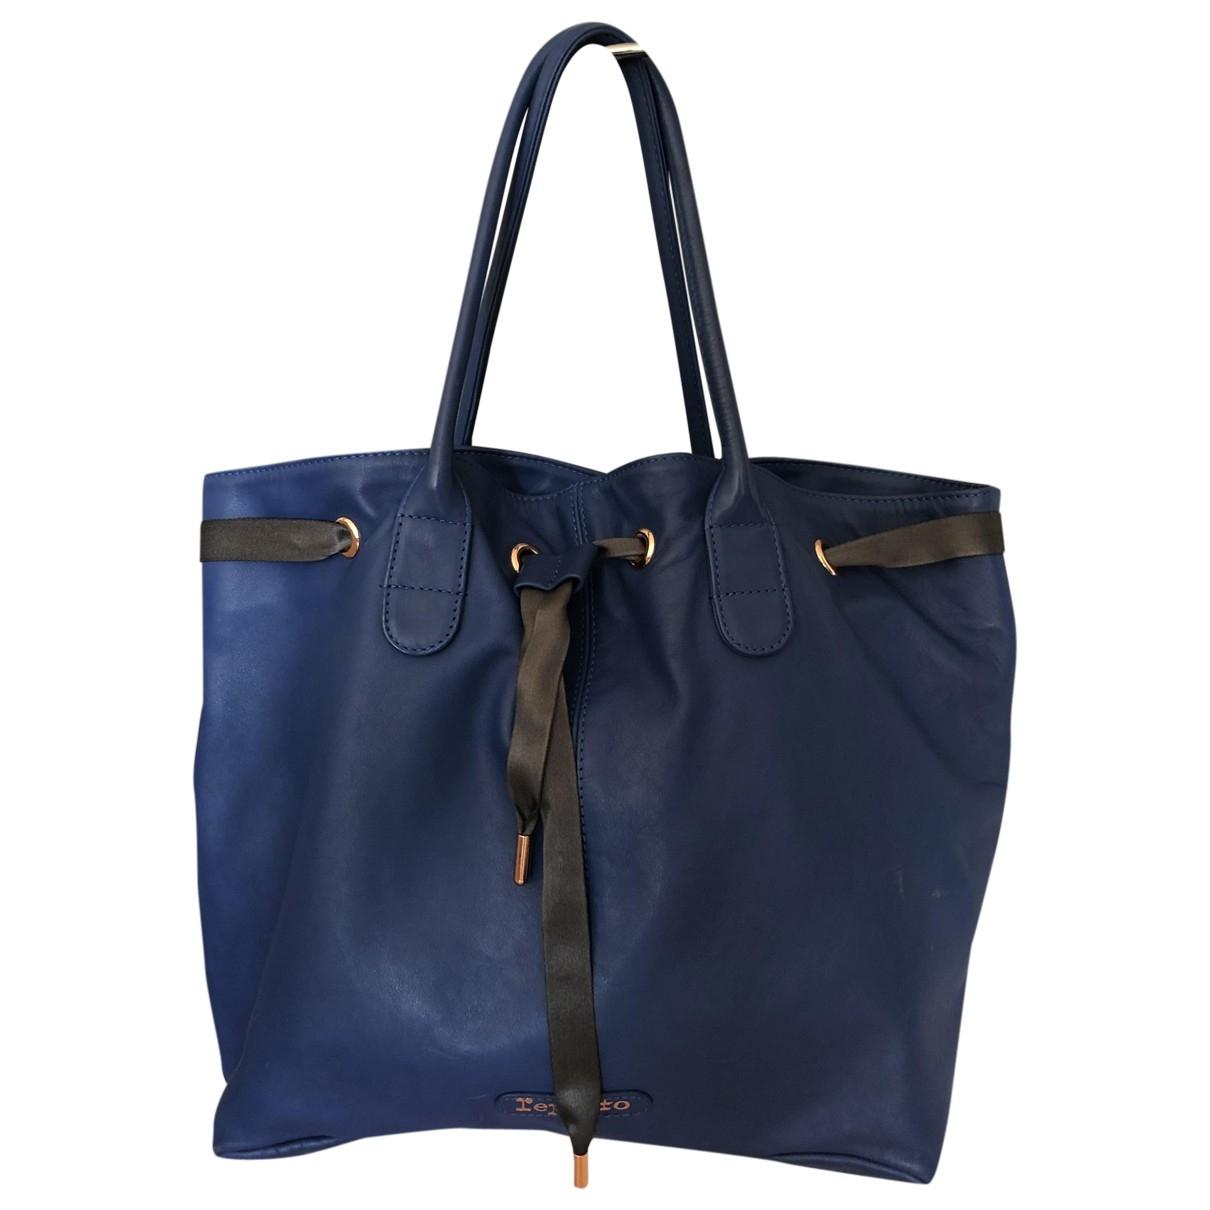 Repetto \N Handtasche in  Blau Leder